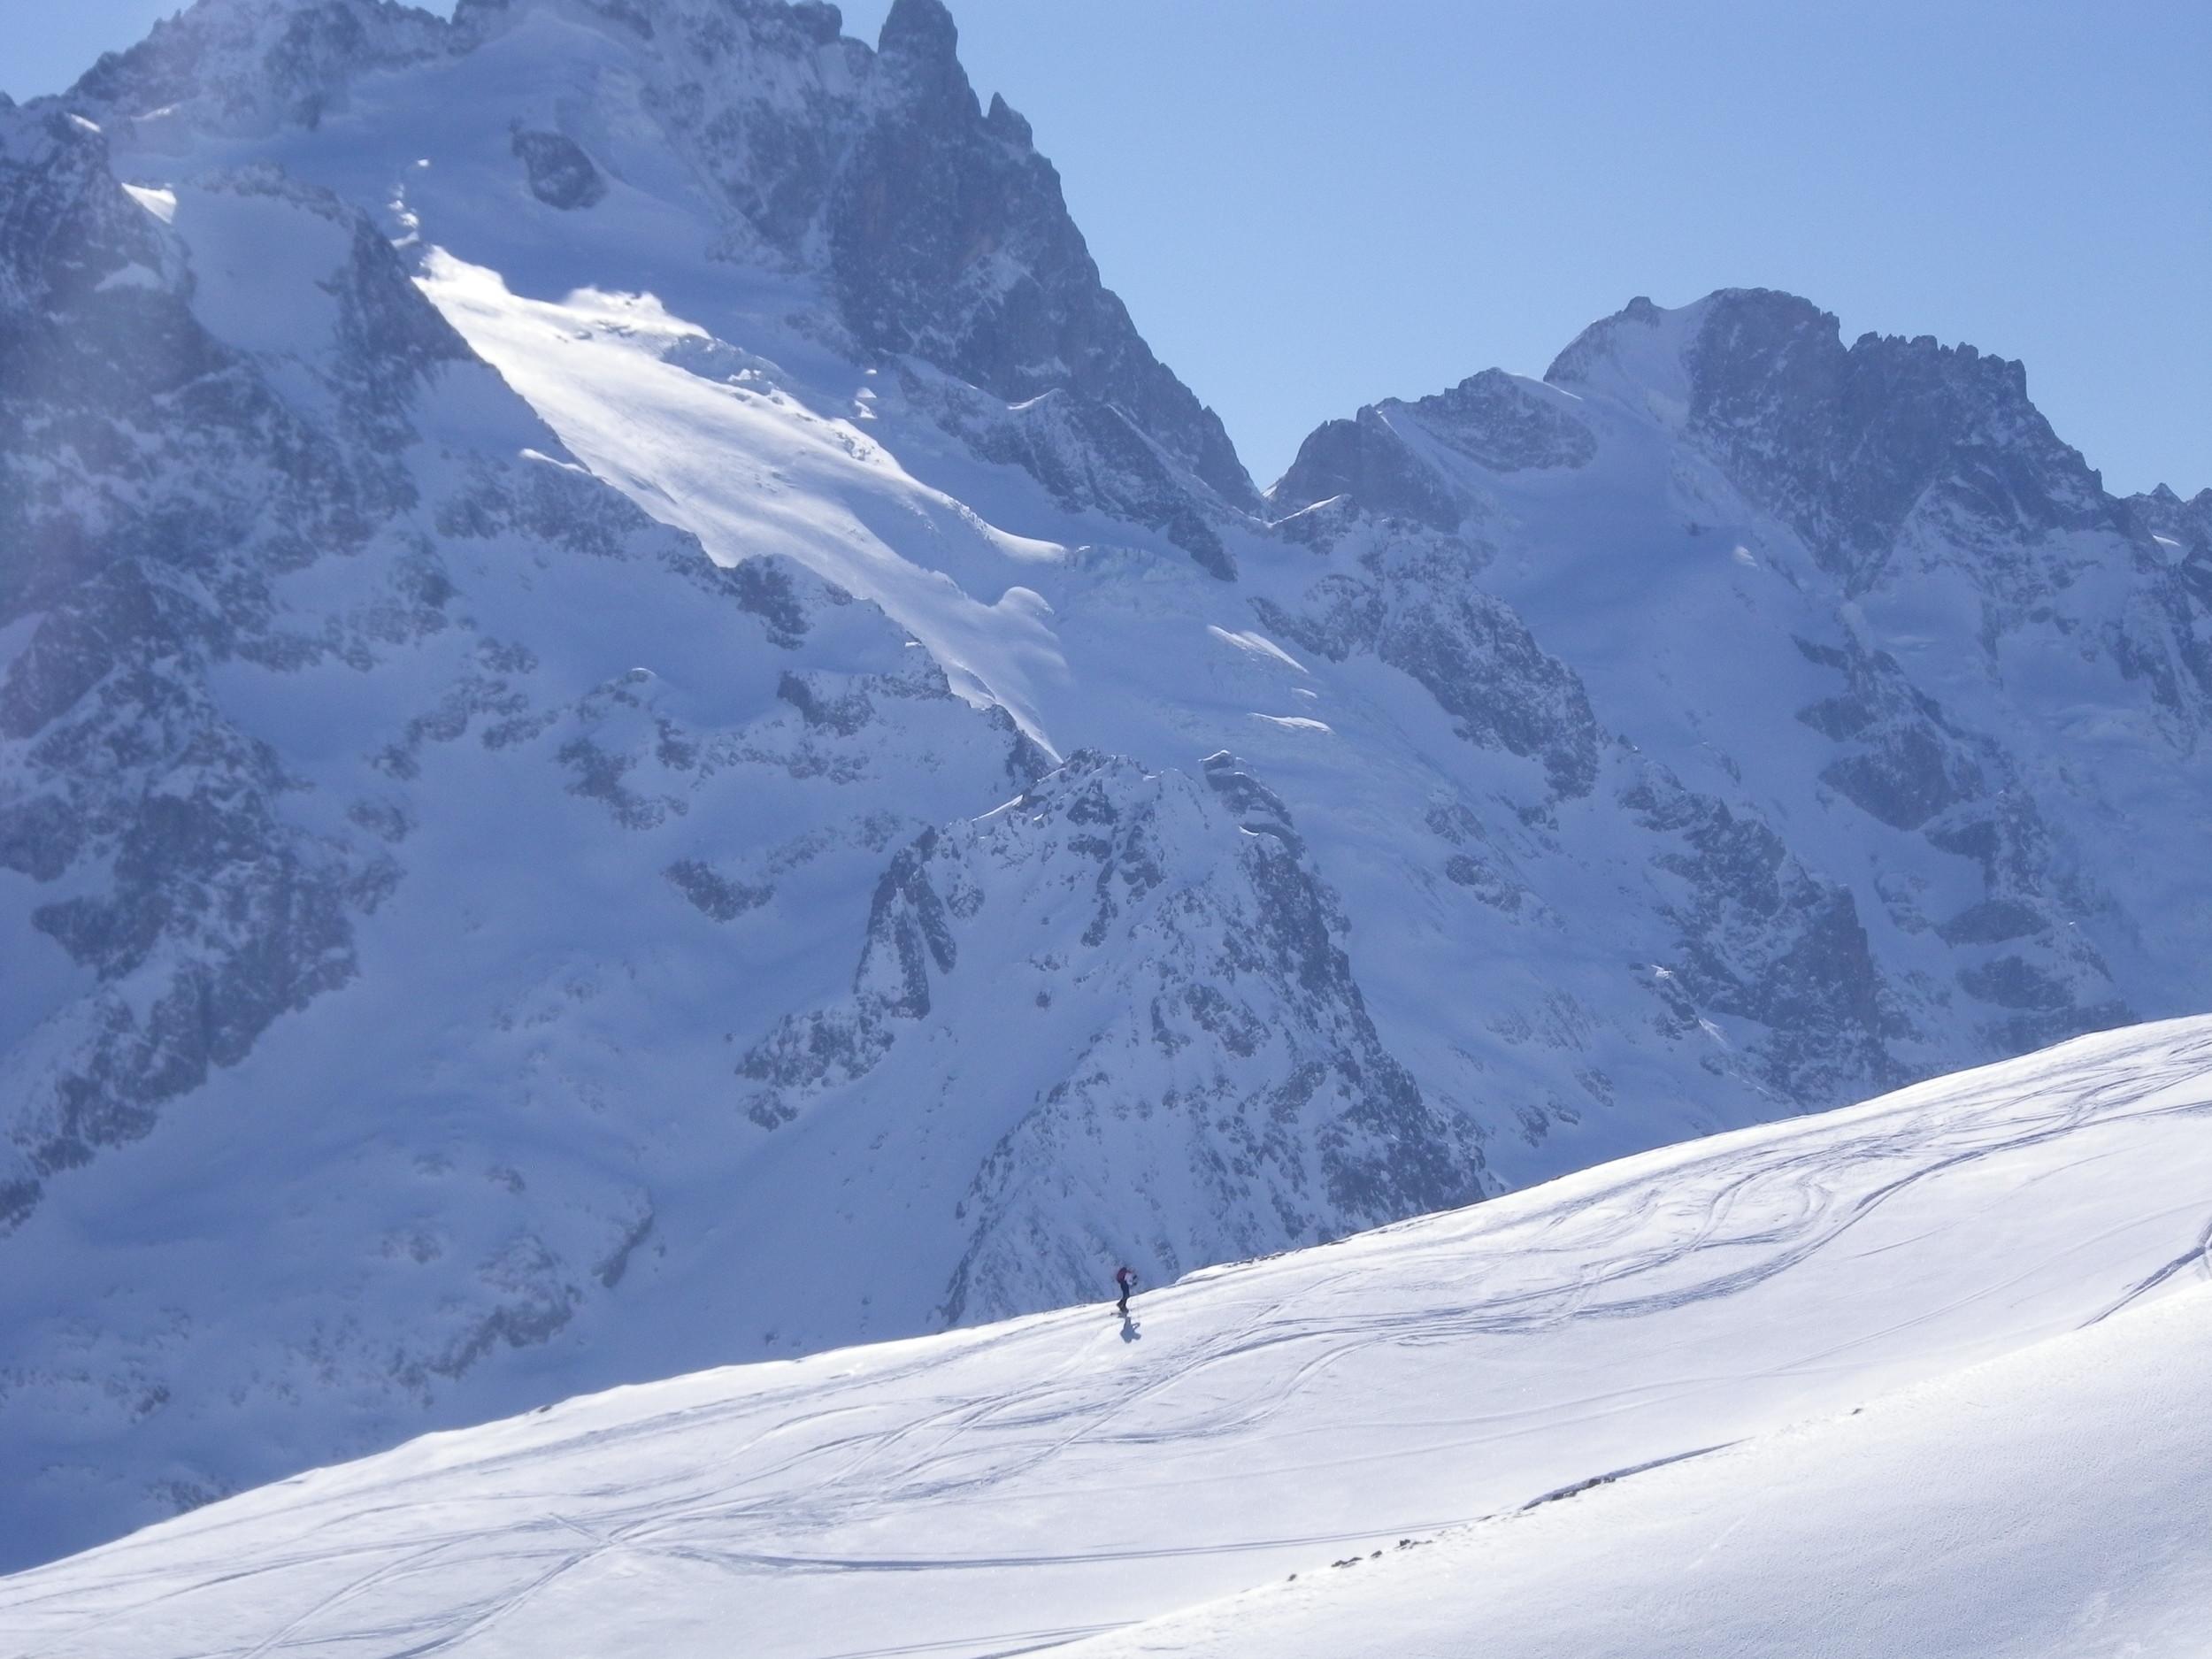 Ski touring on the Plateau d'Emparis, with La Meije and Le Rateau behind